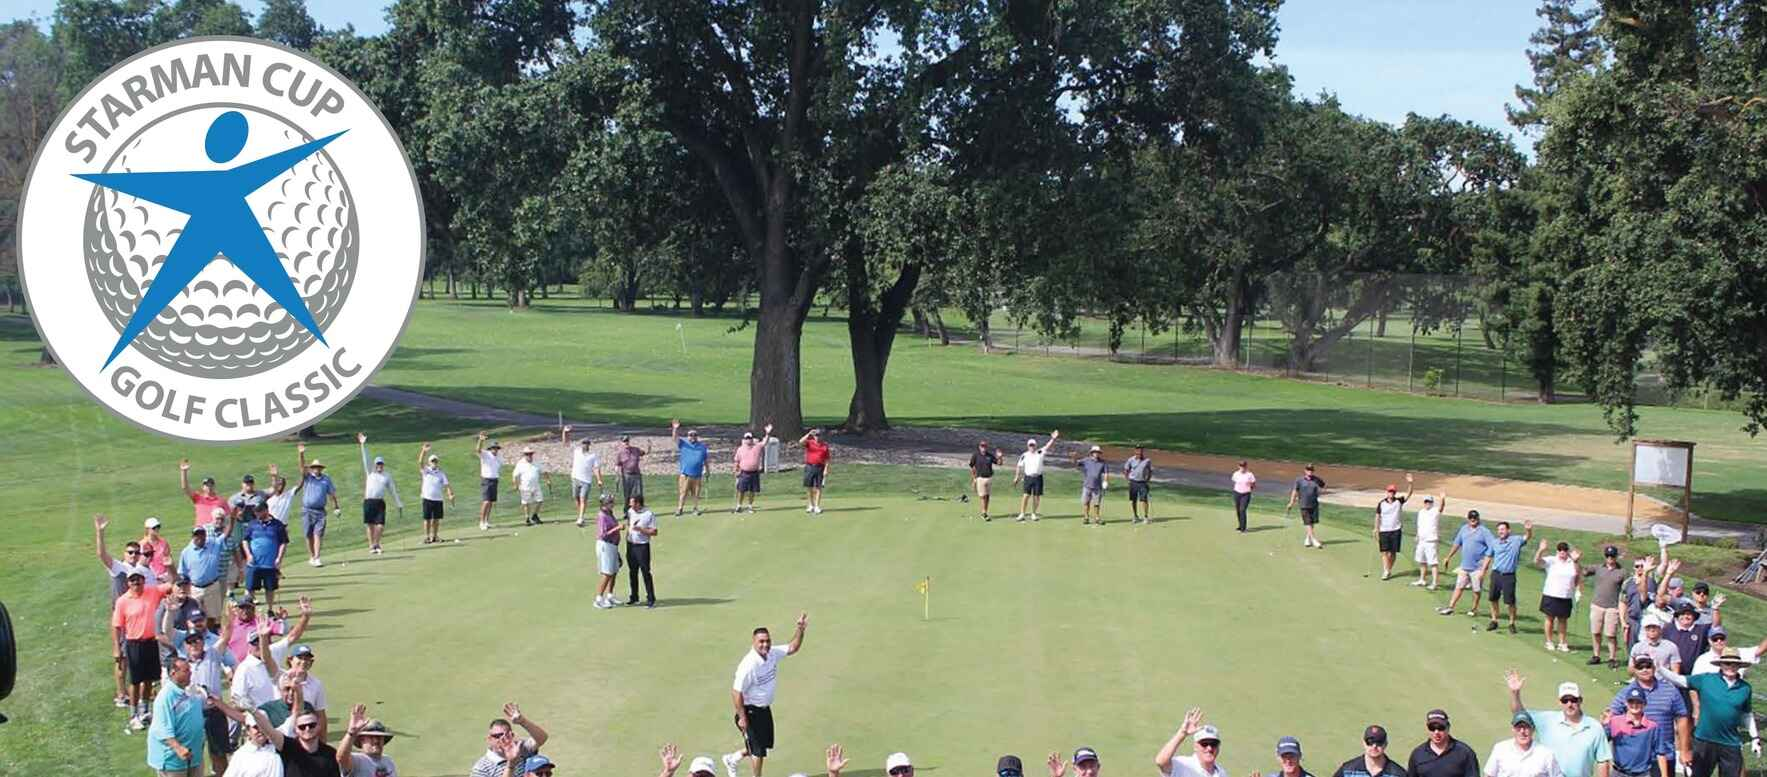 Starman Cup Golf Classic image